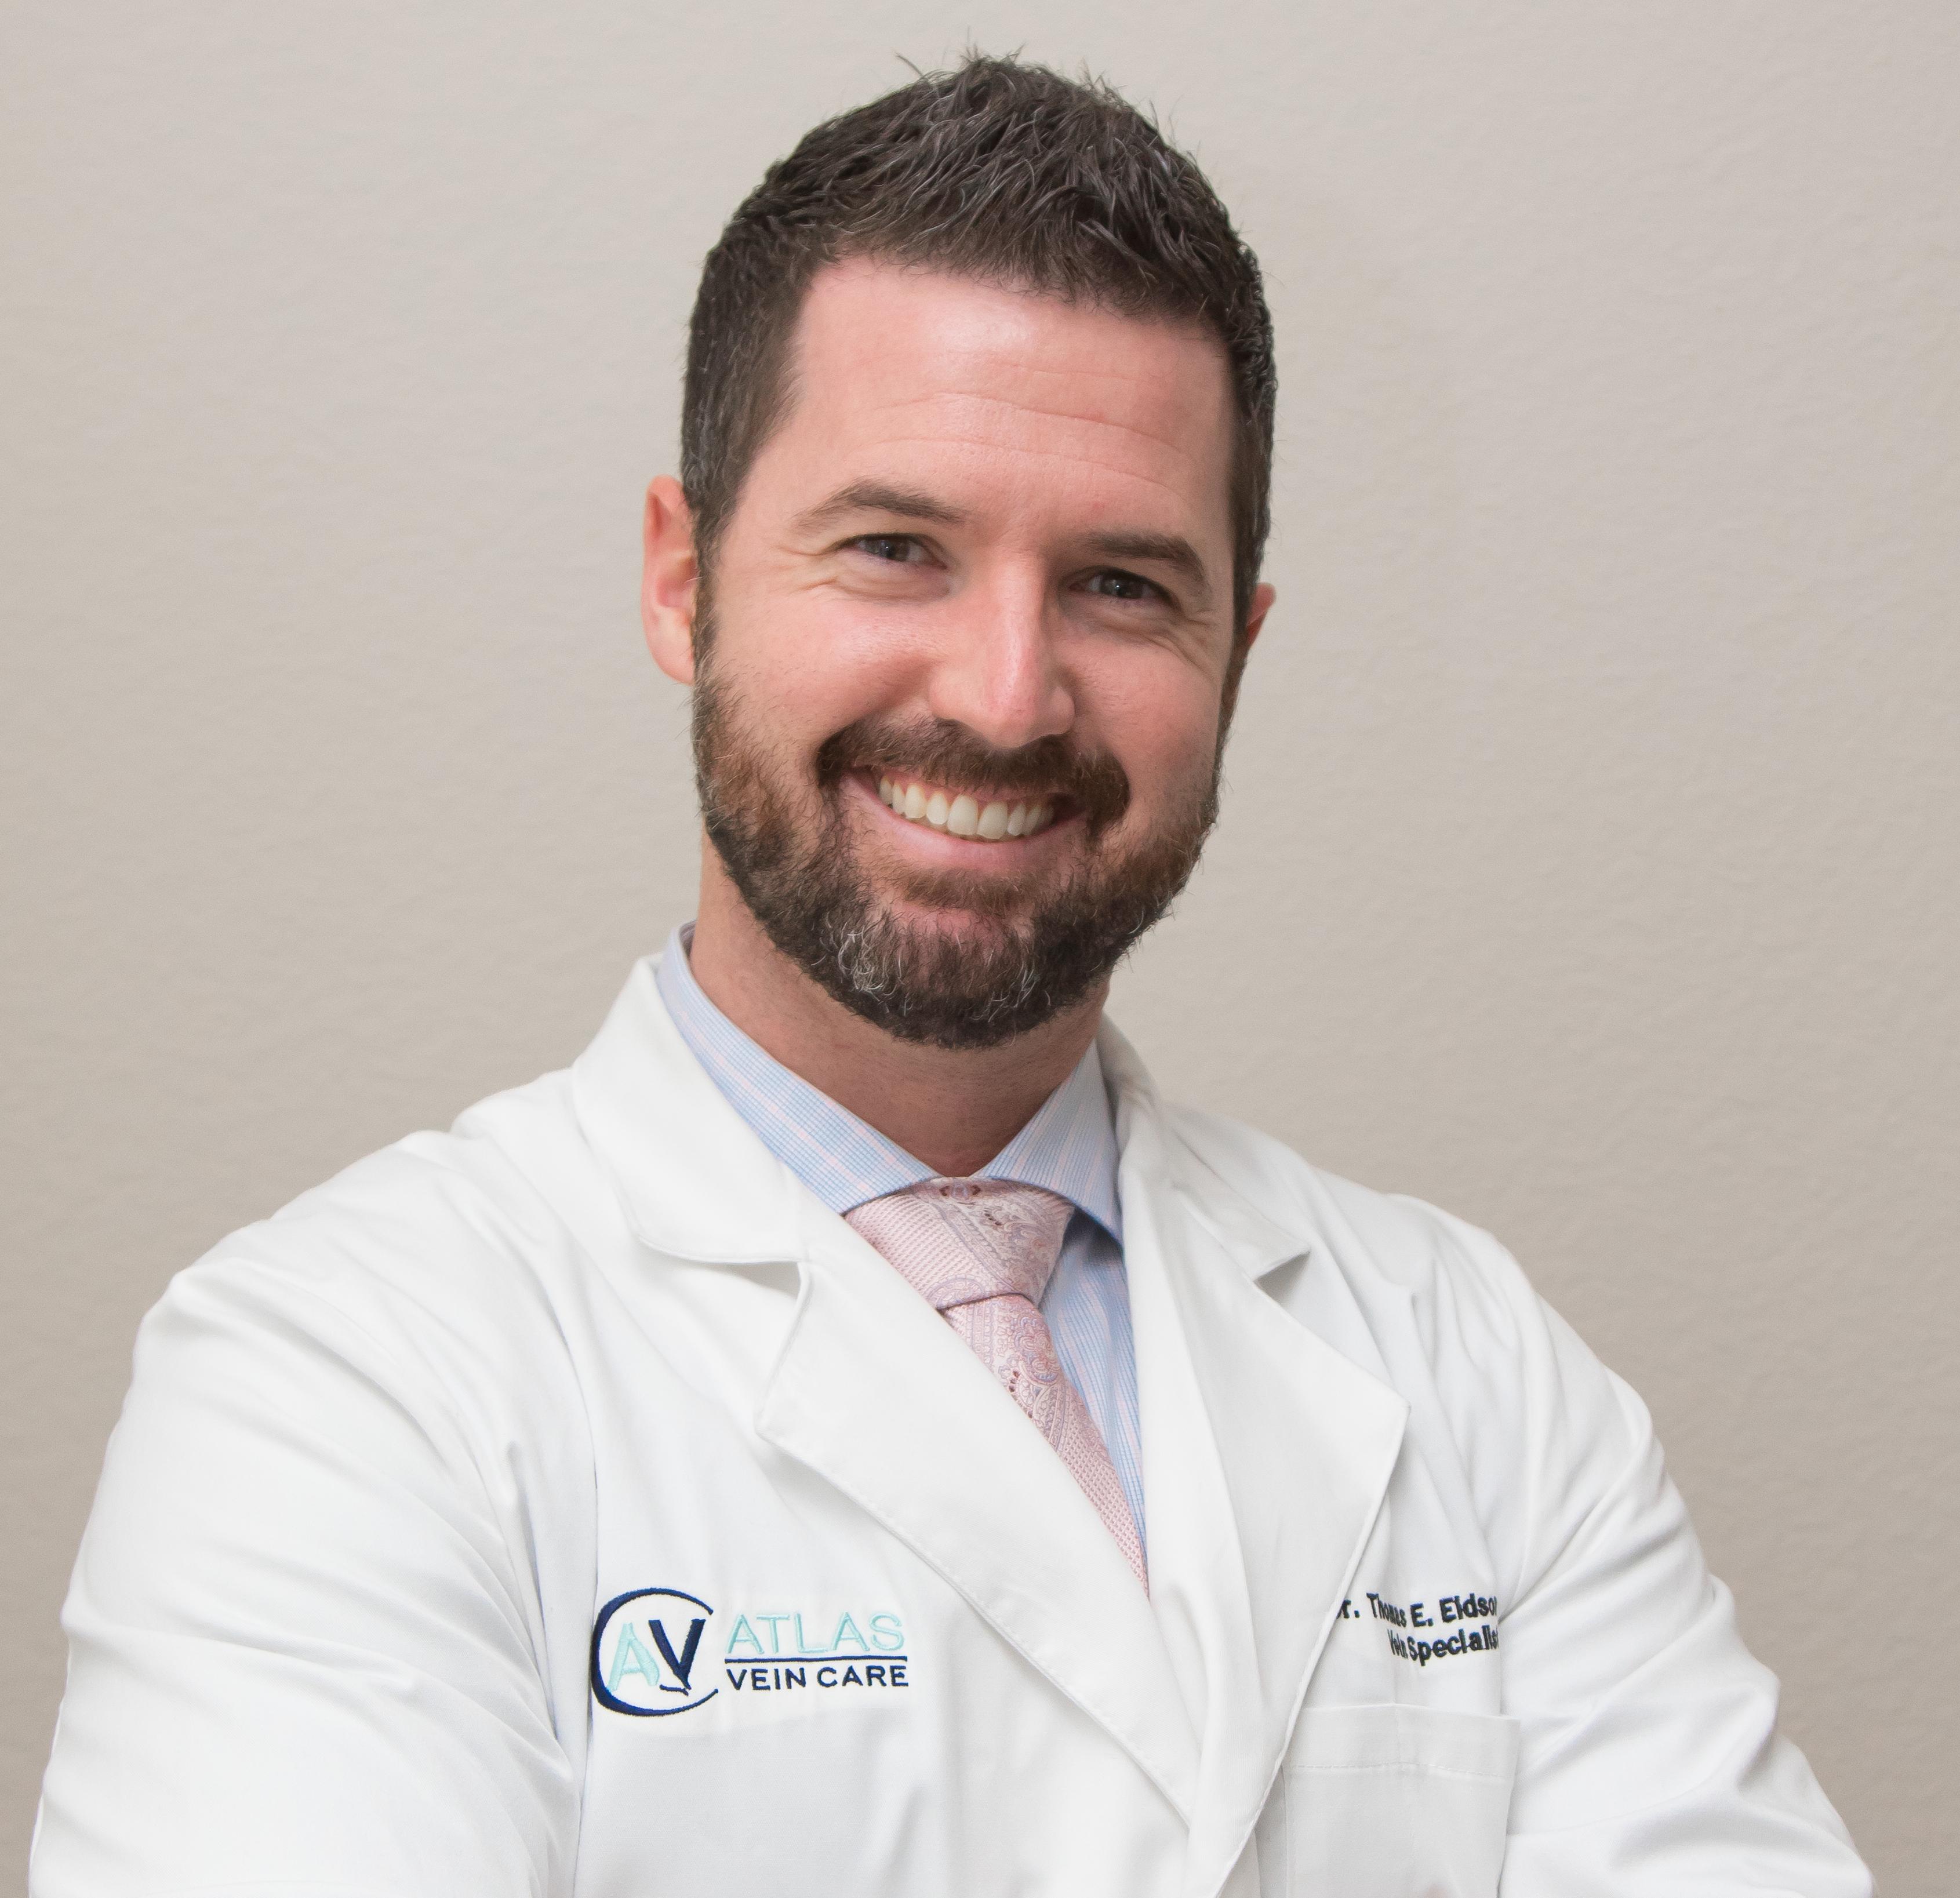 Dr. Thomas Eidson Atlas Vein Care Arlington TX